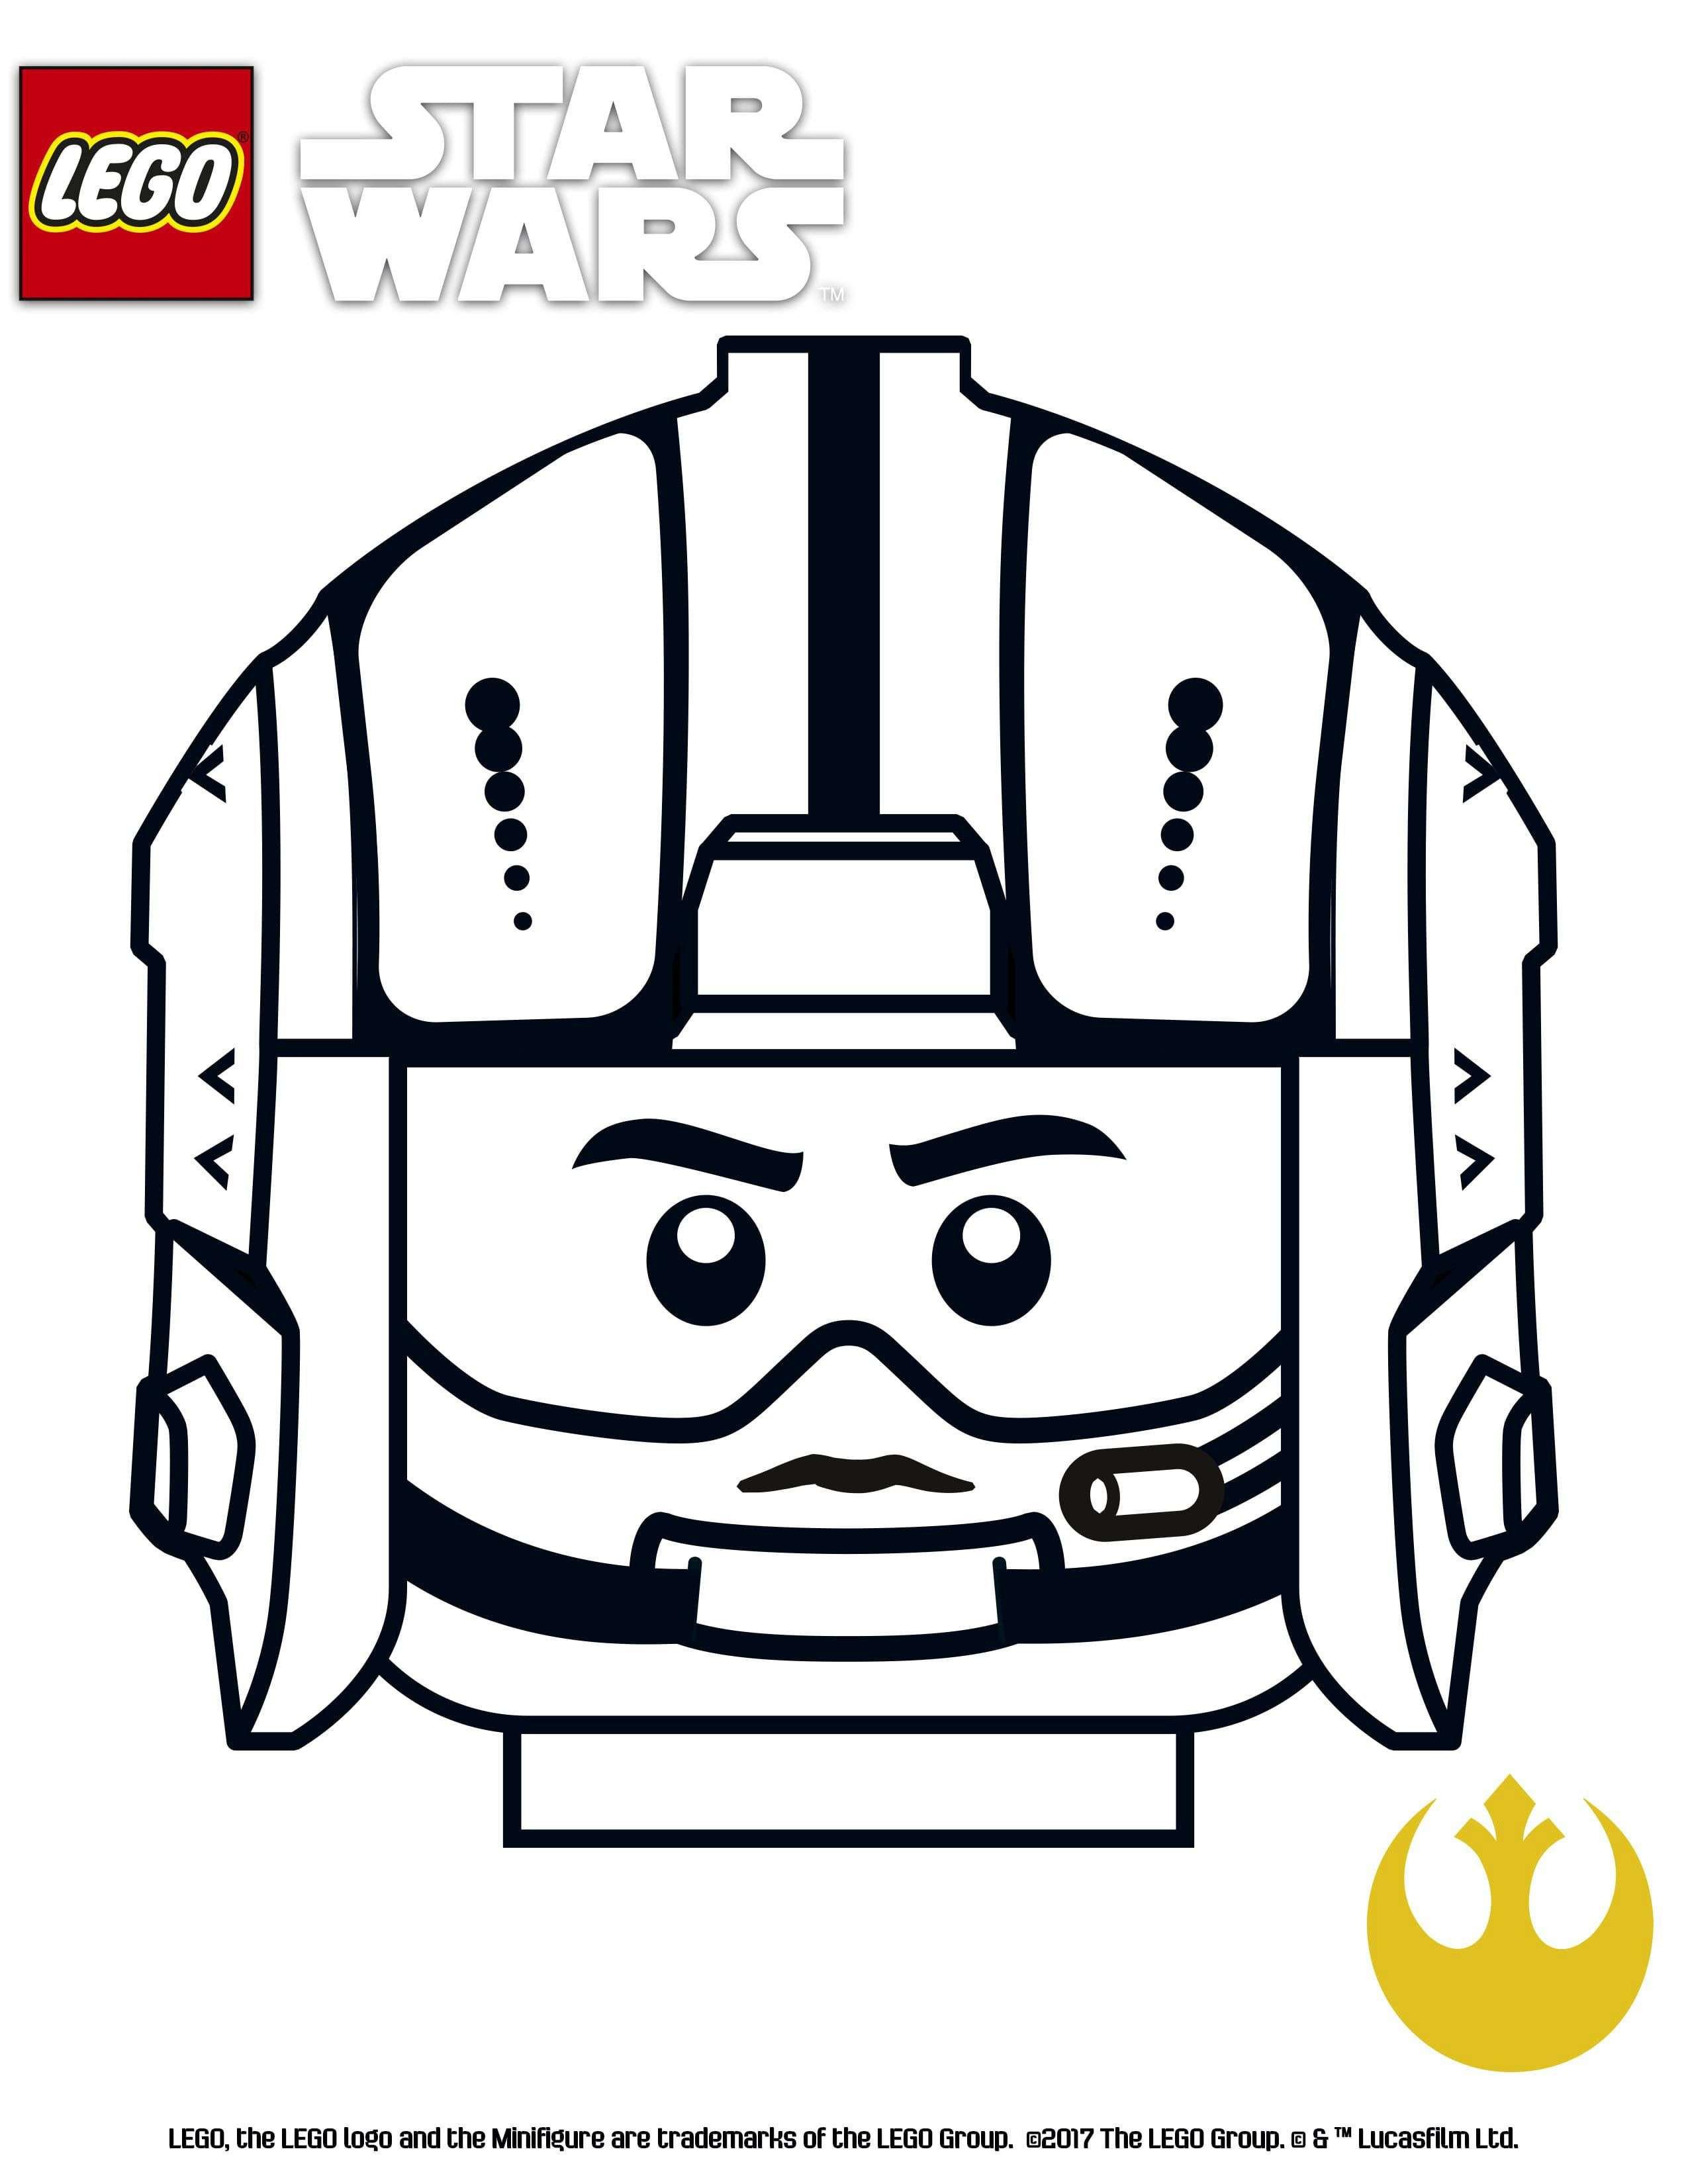 Lego Star Wars Ausmalbild Das Beste Von Lego Starwars Coloring Pages Christmas Coloring Pages Lego Schön Stock